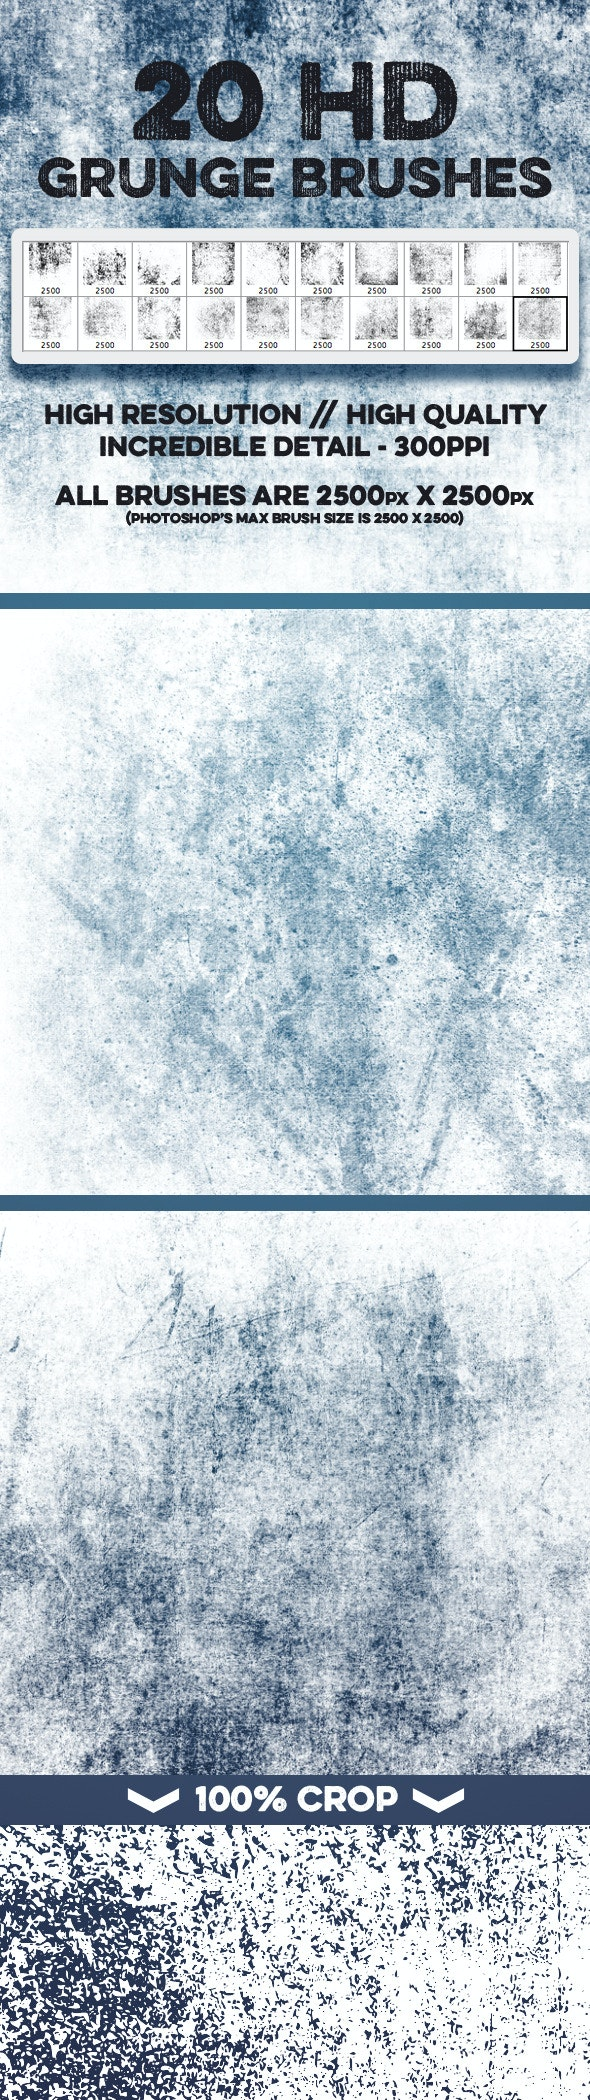 20 HD Grunge Theme Brushes - Volume 1 - Grunge Brushes